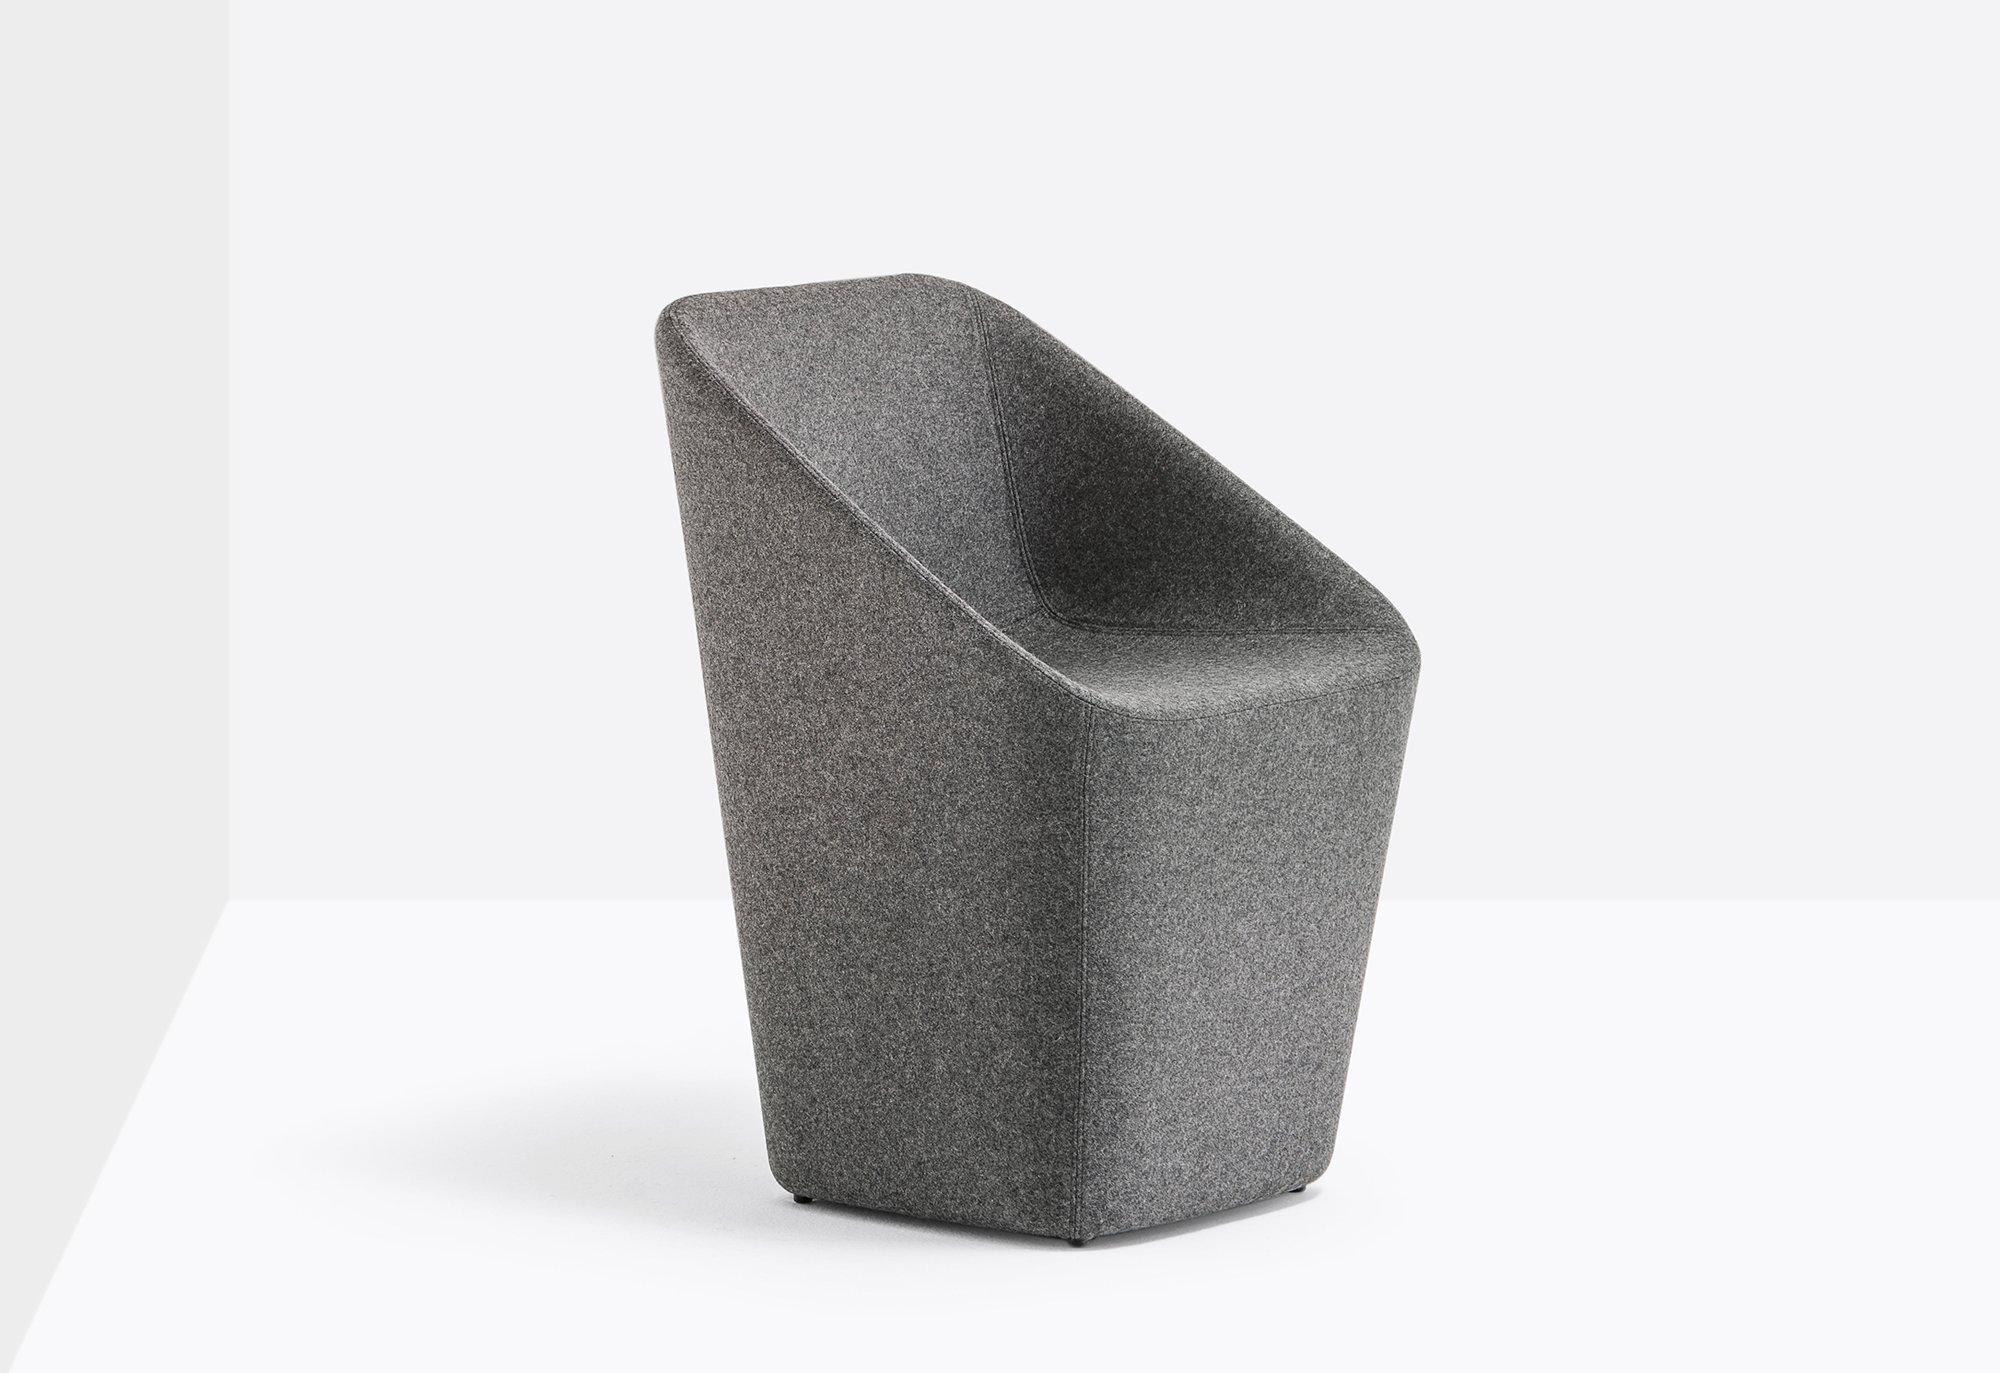 LOG 365 Armchair from Pedrali, designed by Busetti Garuti Redaelli